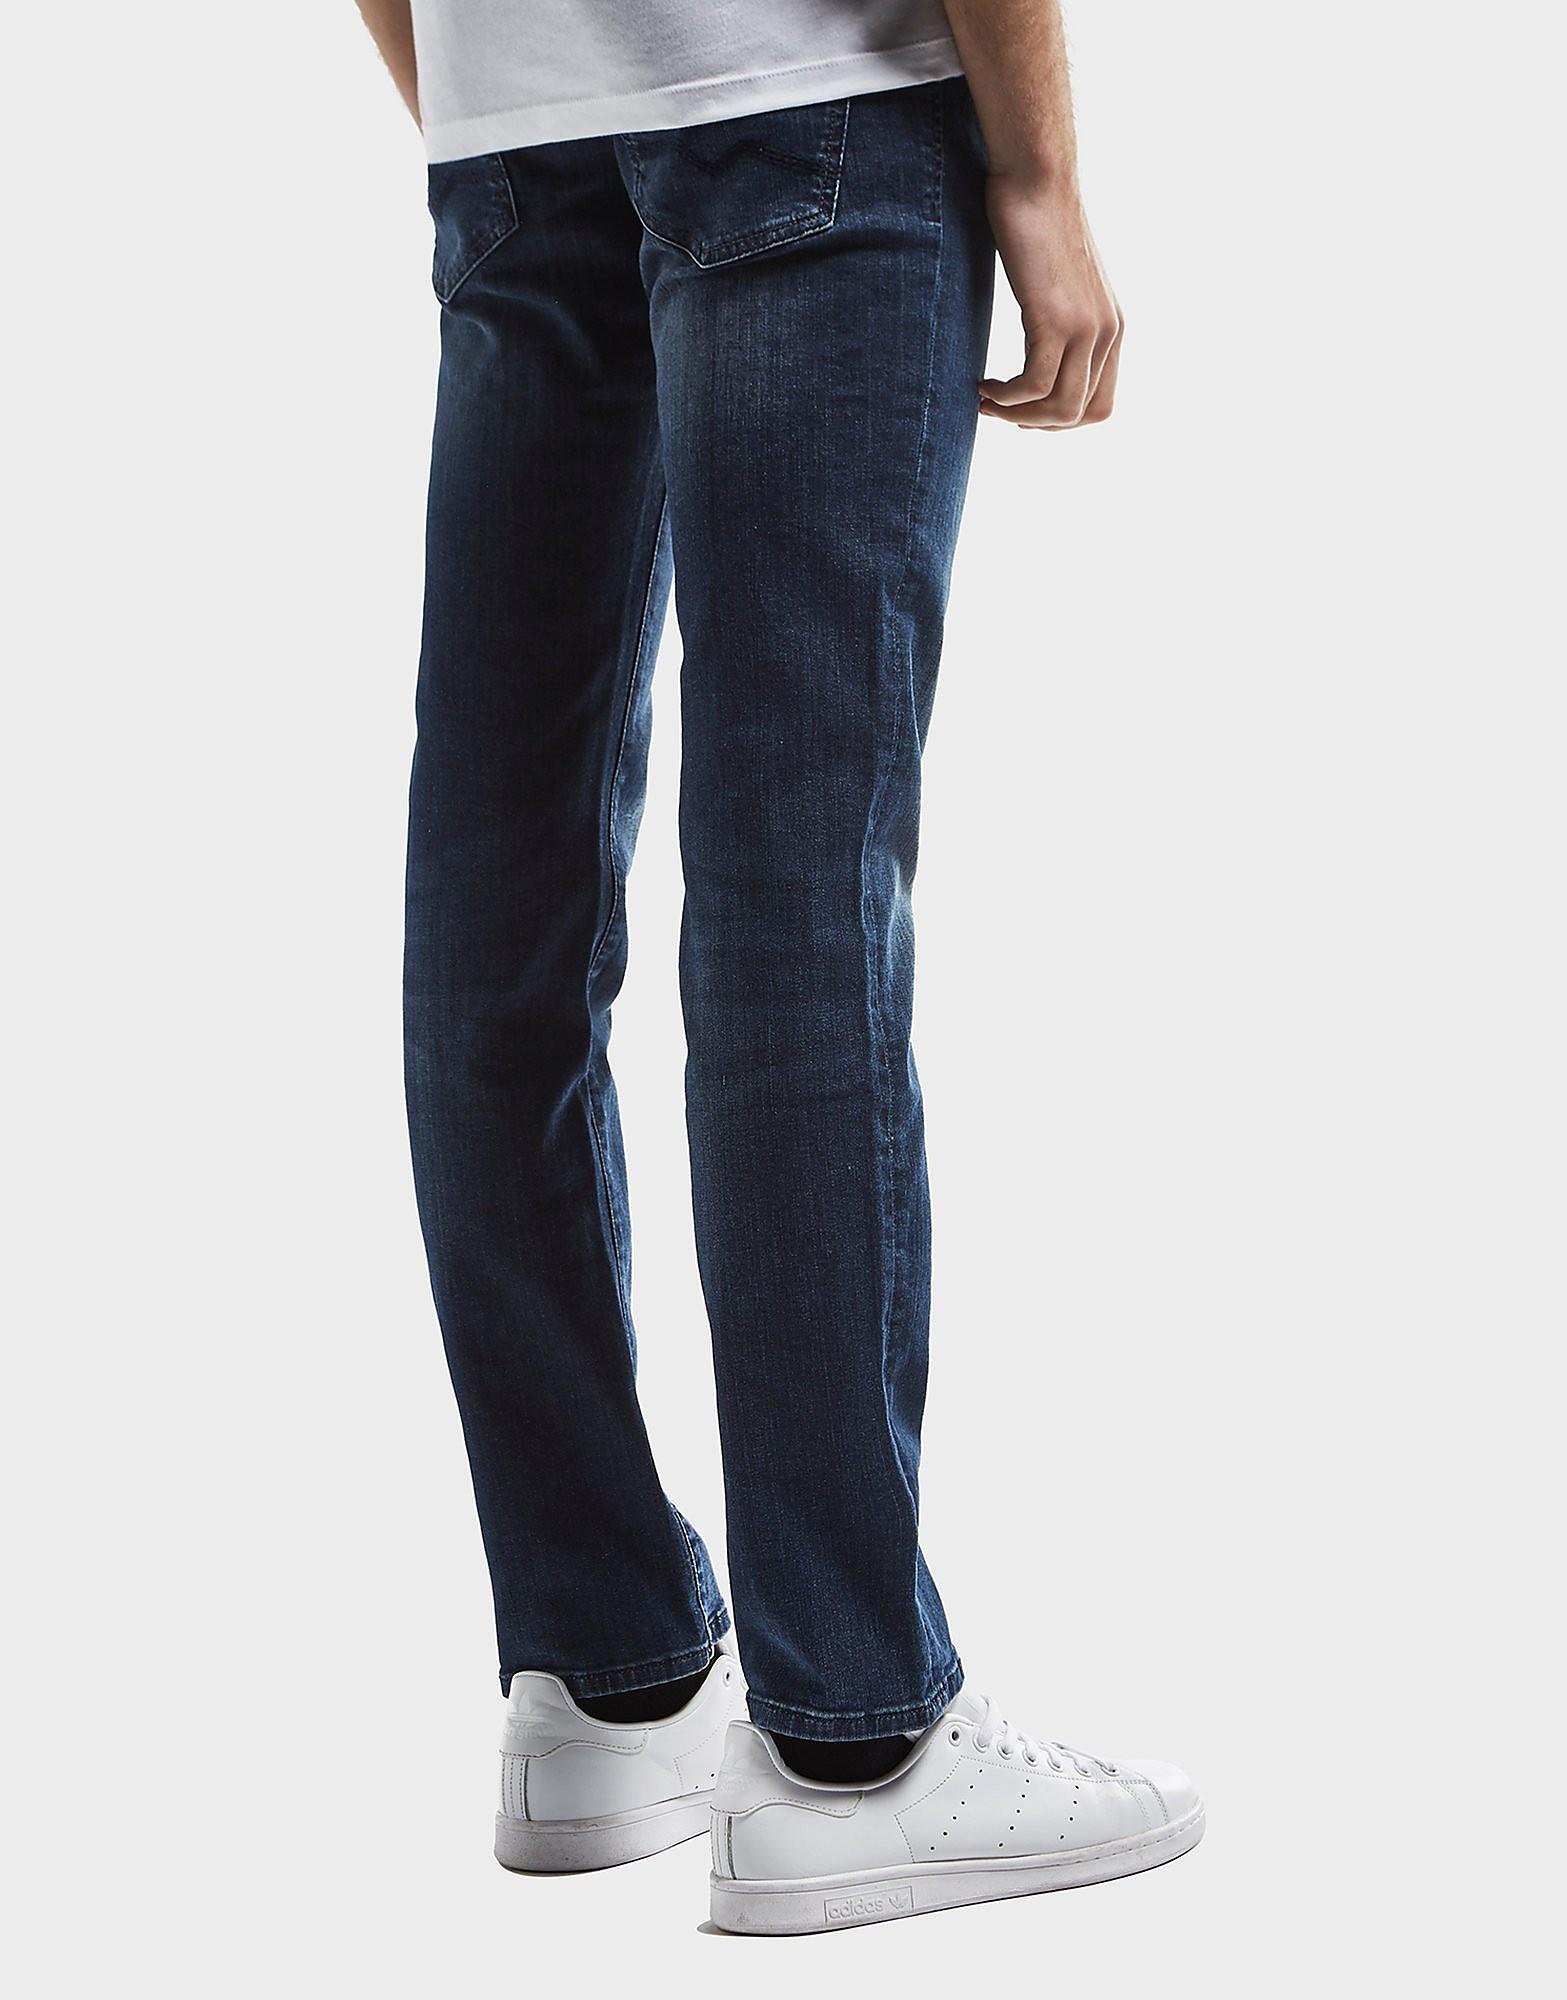 BOSS Orange 63 Denim Jeans